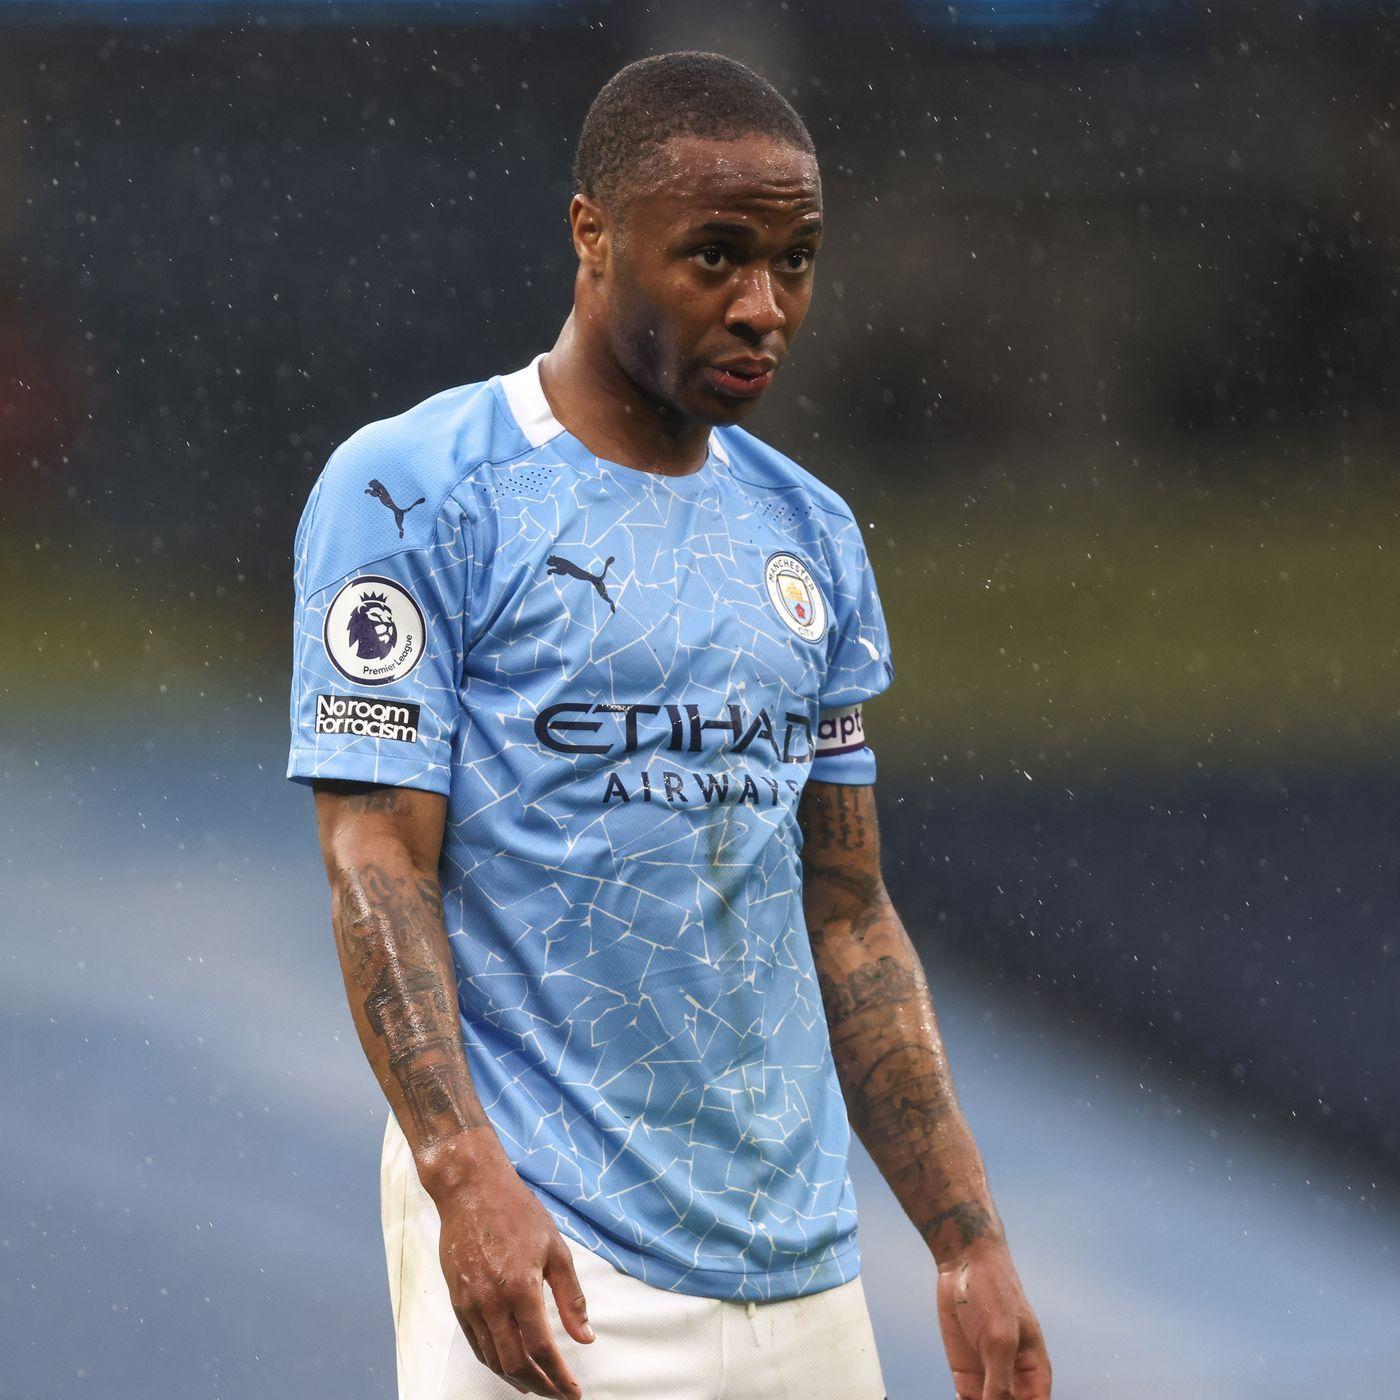 The Agenda: Should Liverpool consider a Raheem Sterling reunion?